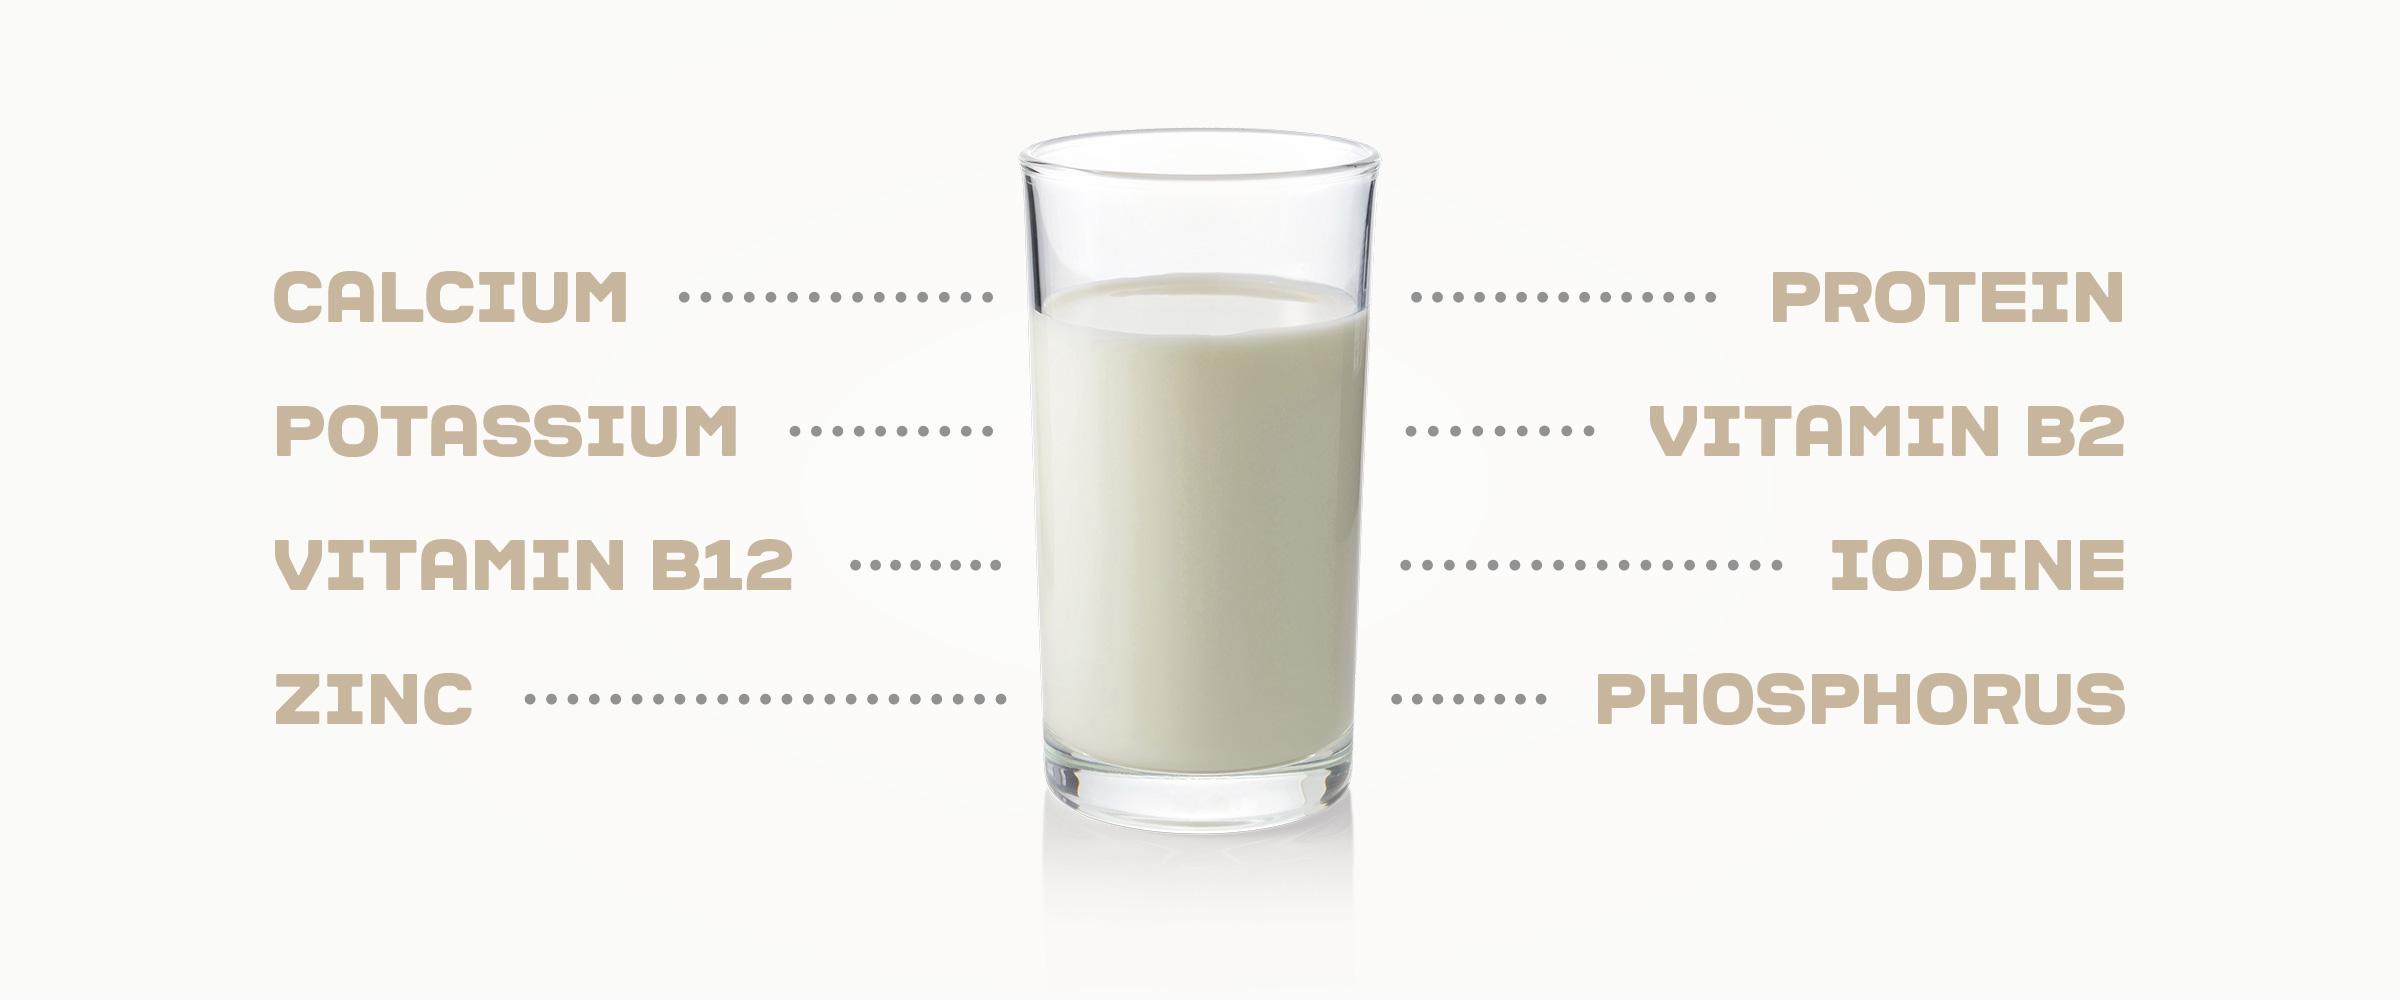 Organic Milk Facts | Arla Foods